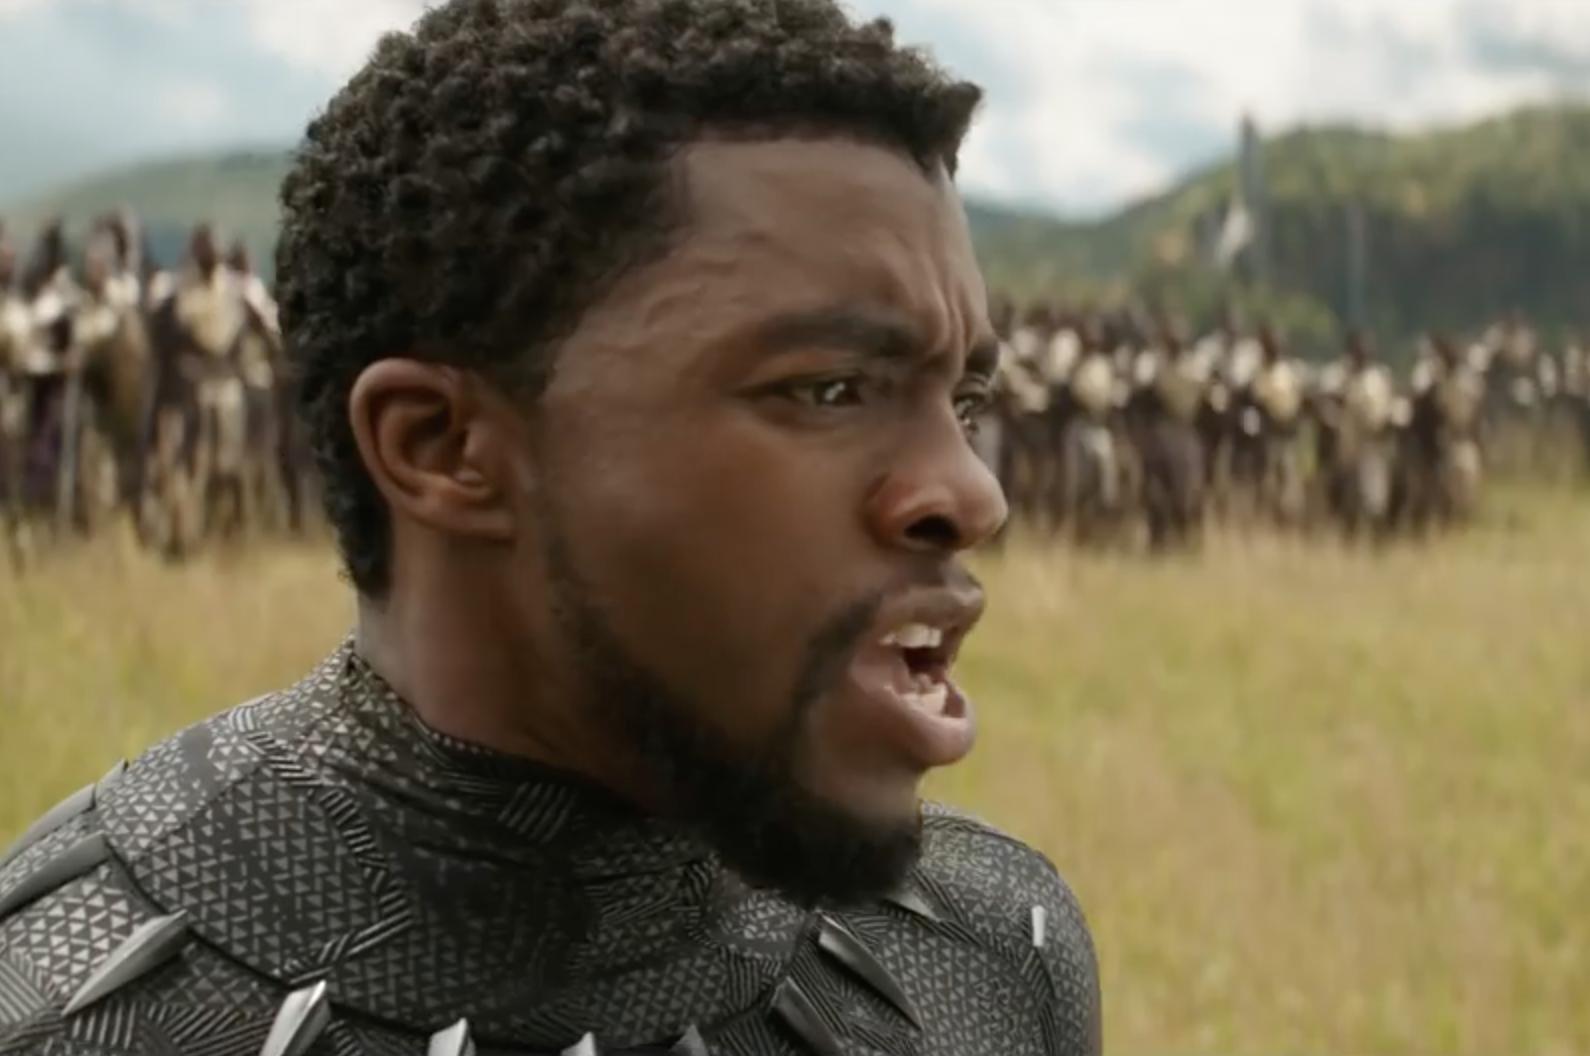 Black Panther in Avengers: Infinity War teaser (April 8)